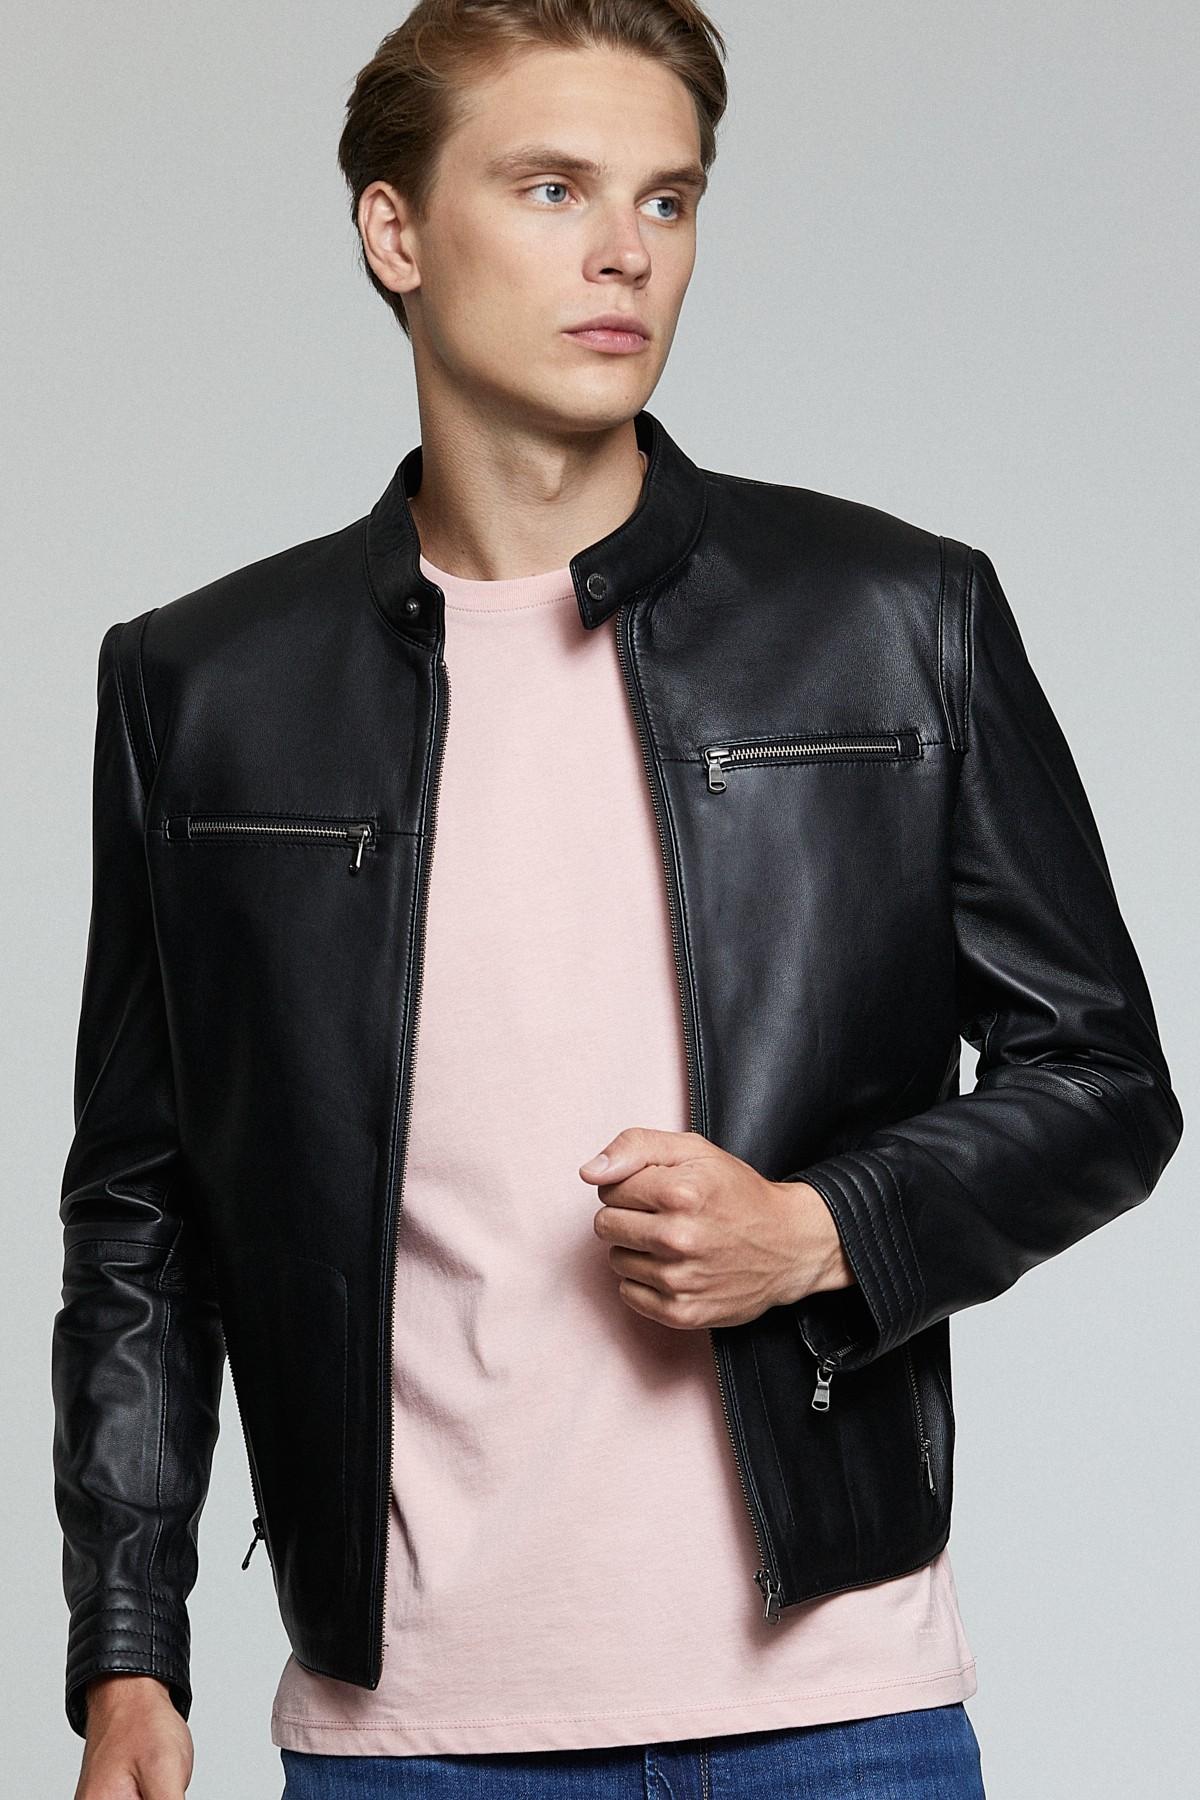 Men's Leather Jackets On Sale